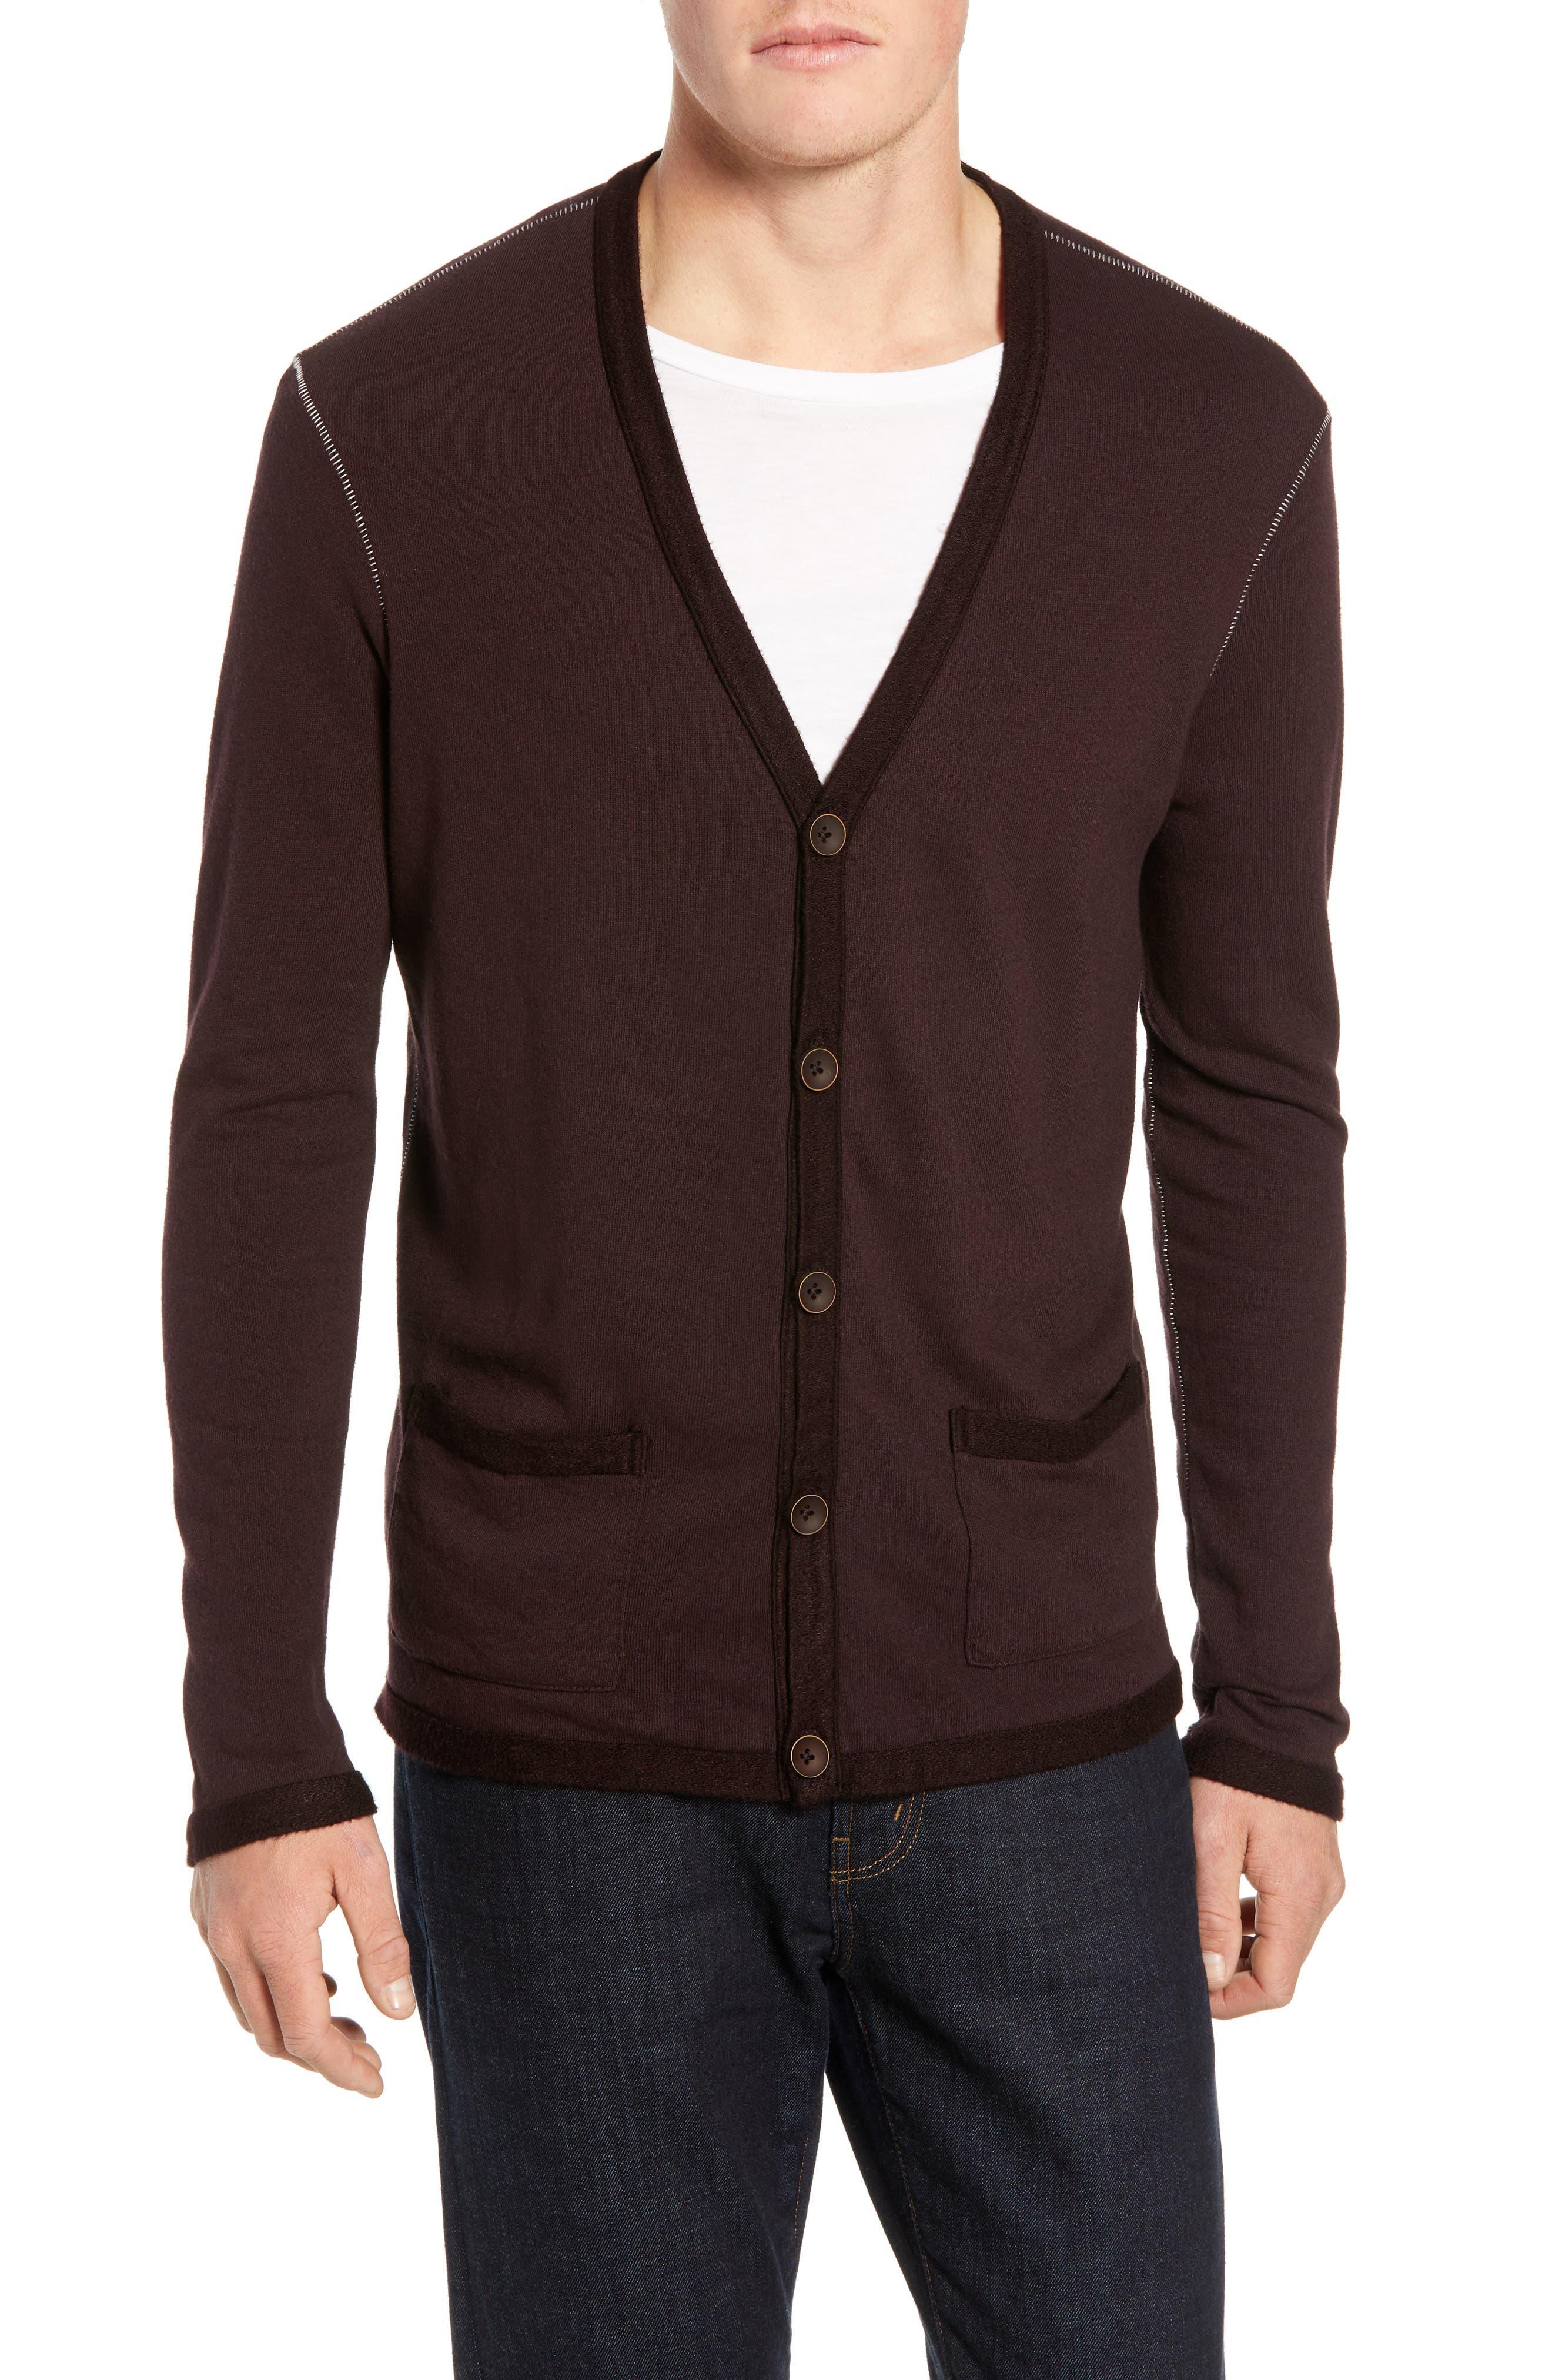 M.singer Cardigan Sweater, Purple